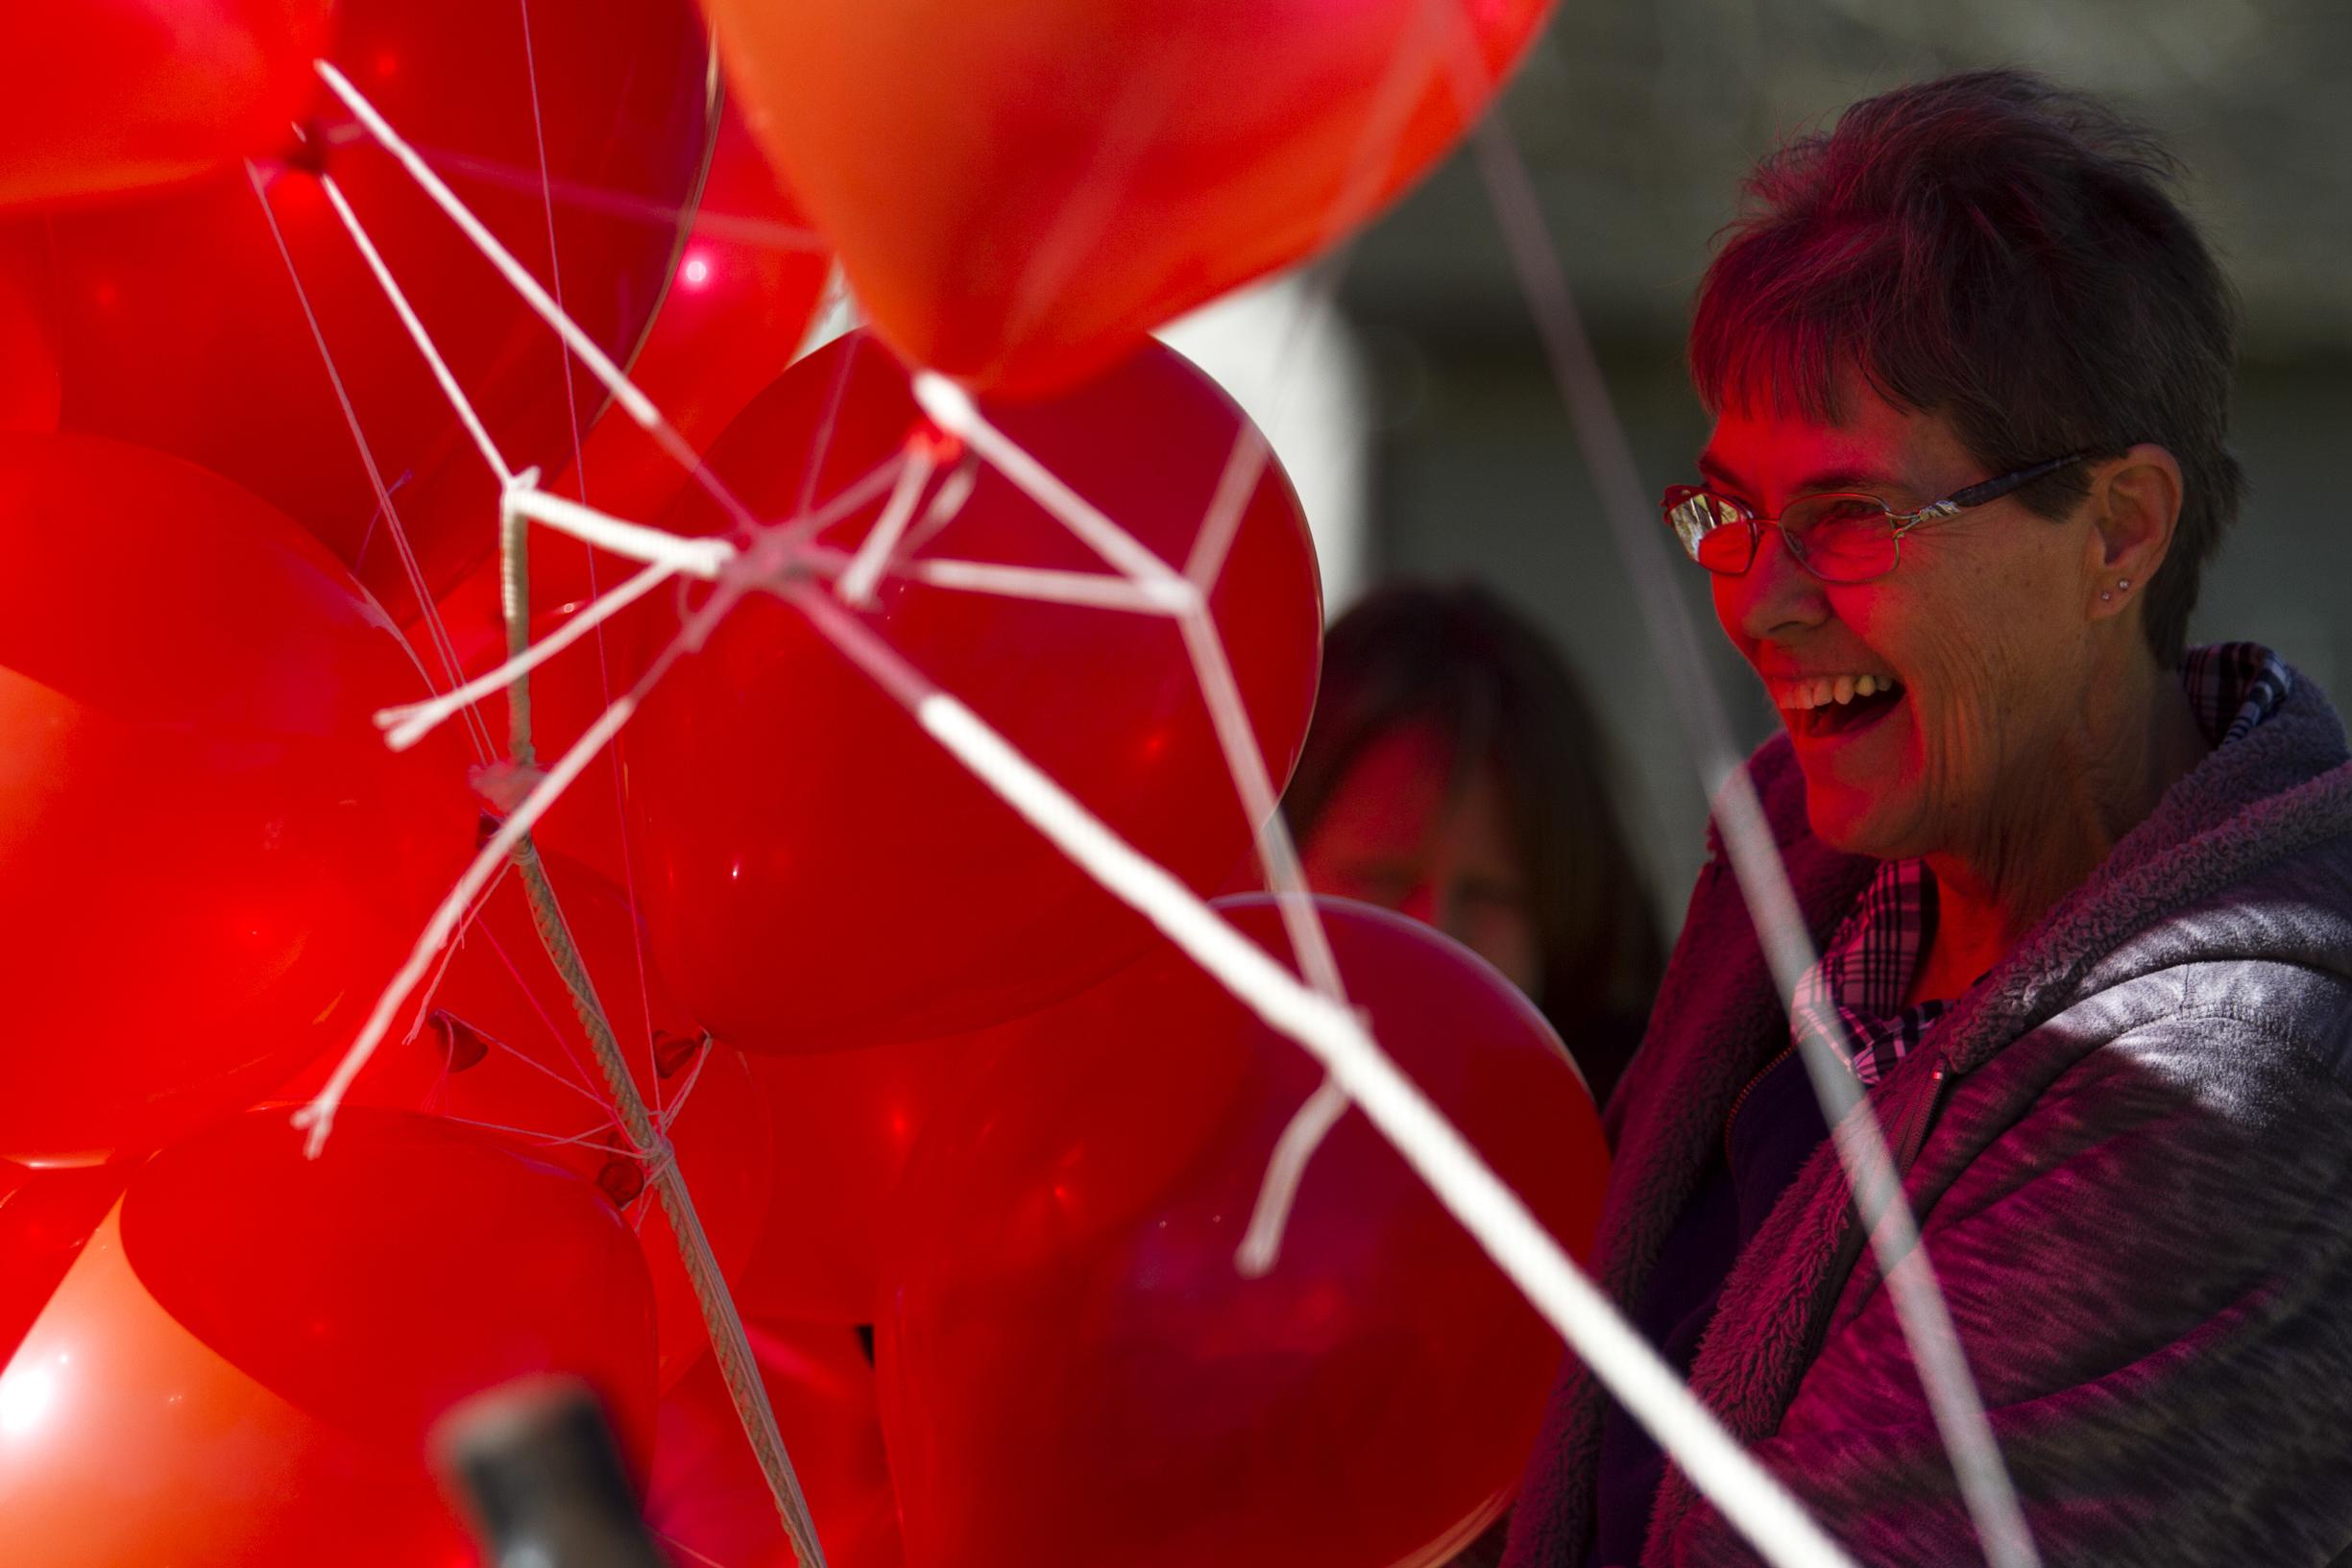 Volunteer Barbara Klozik helps tie down balloons outside near the football field.